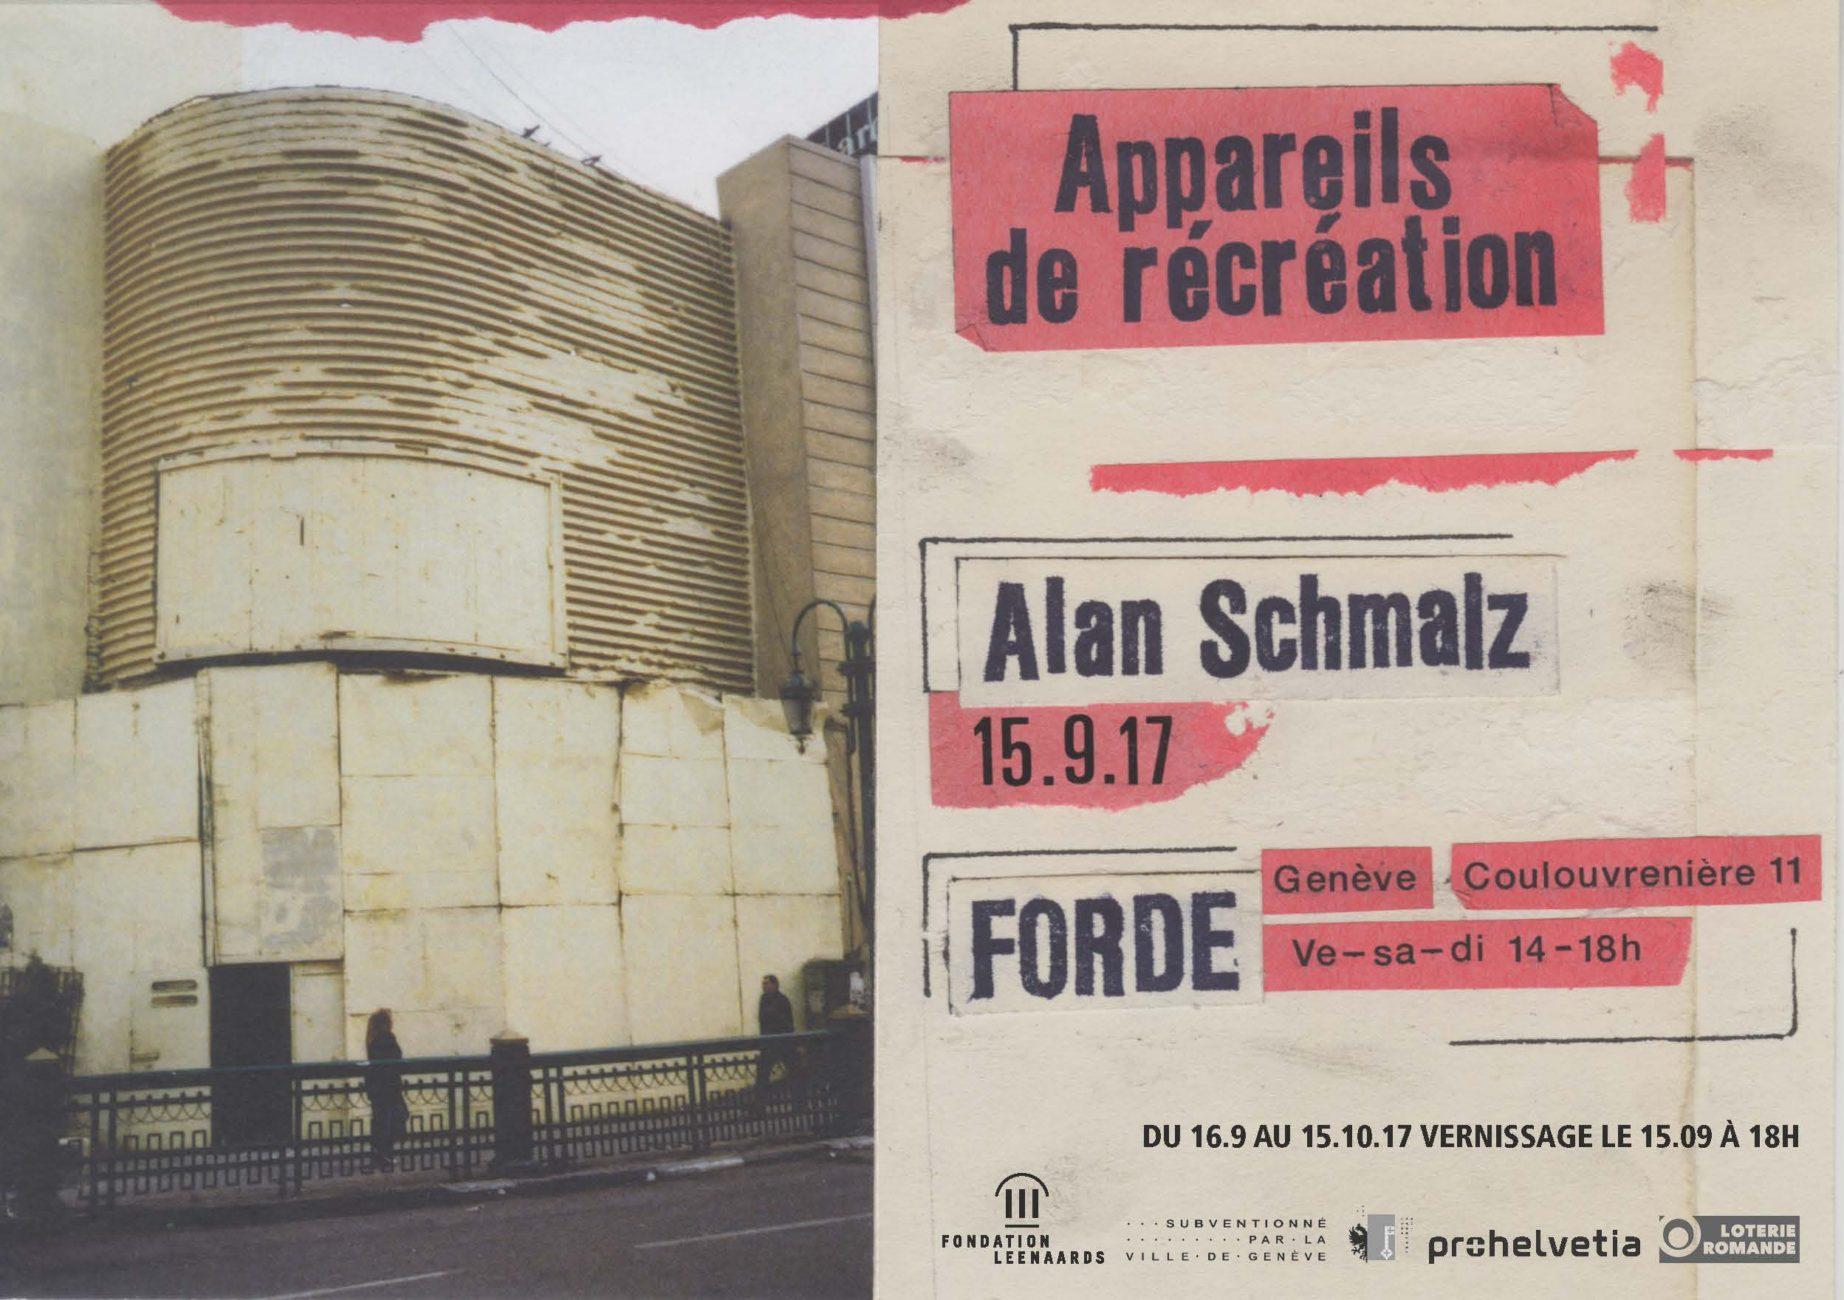 forde - flyer - Alan Schmalz – Appareils de récréation